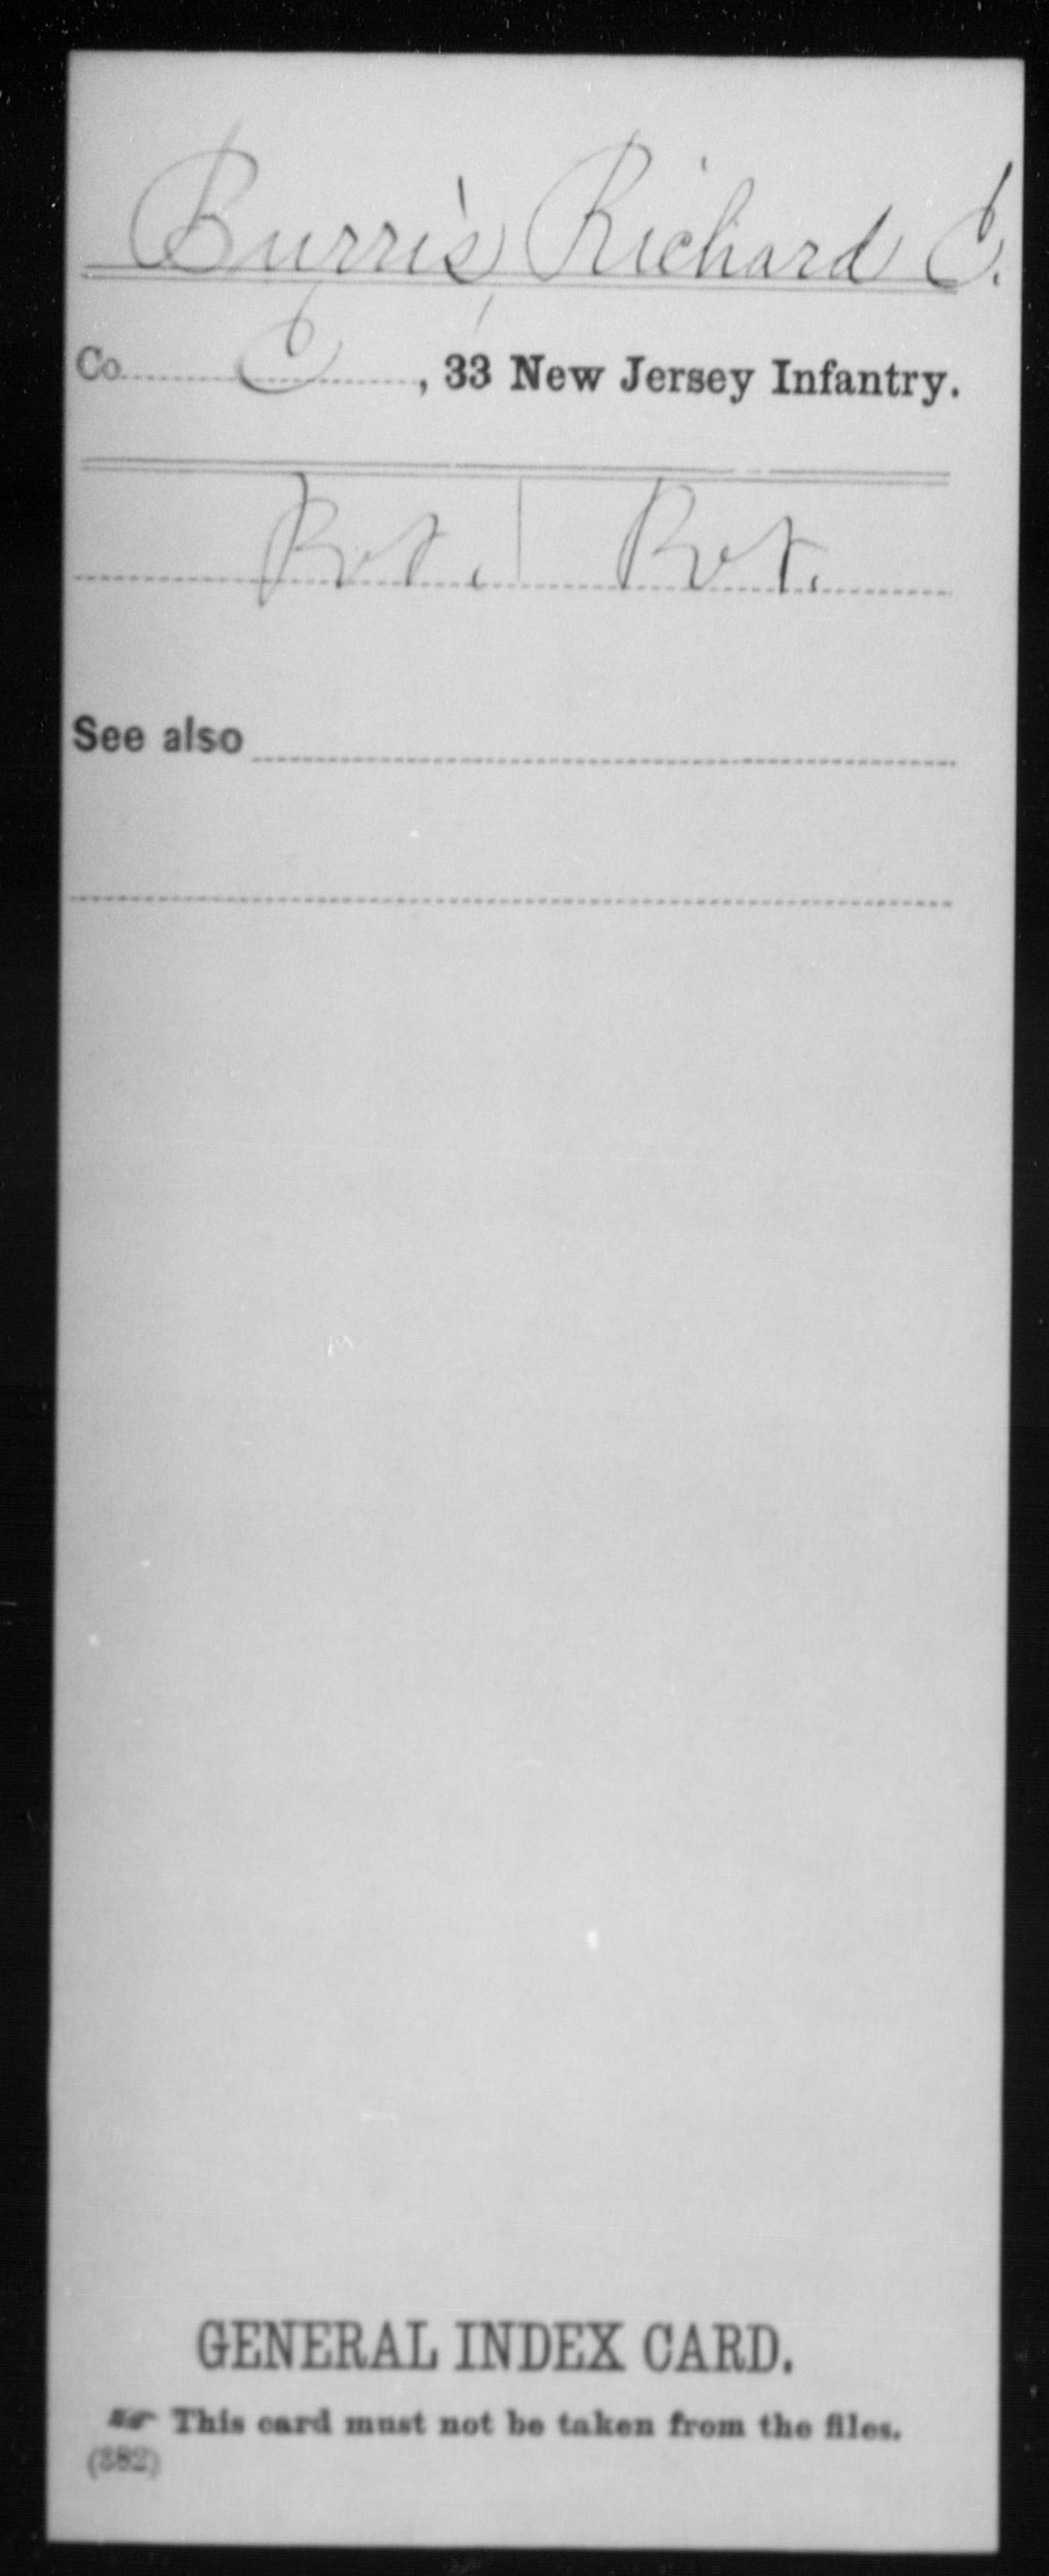 [New Jersey] Burris, Richard C - 33rd Infantry, Company C